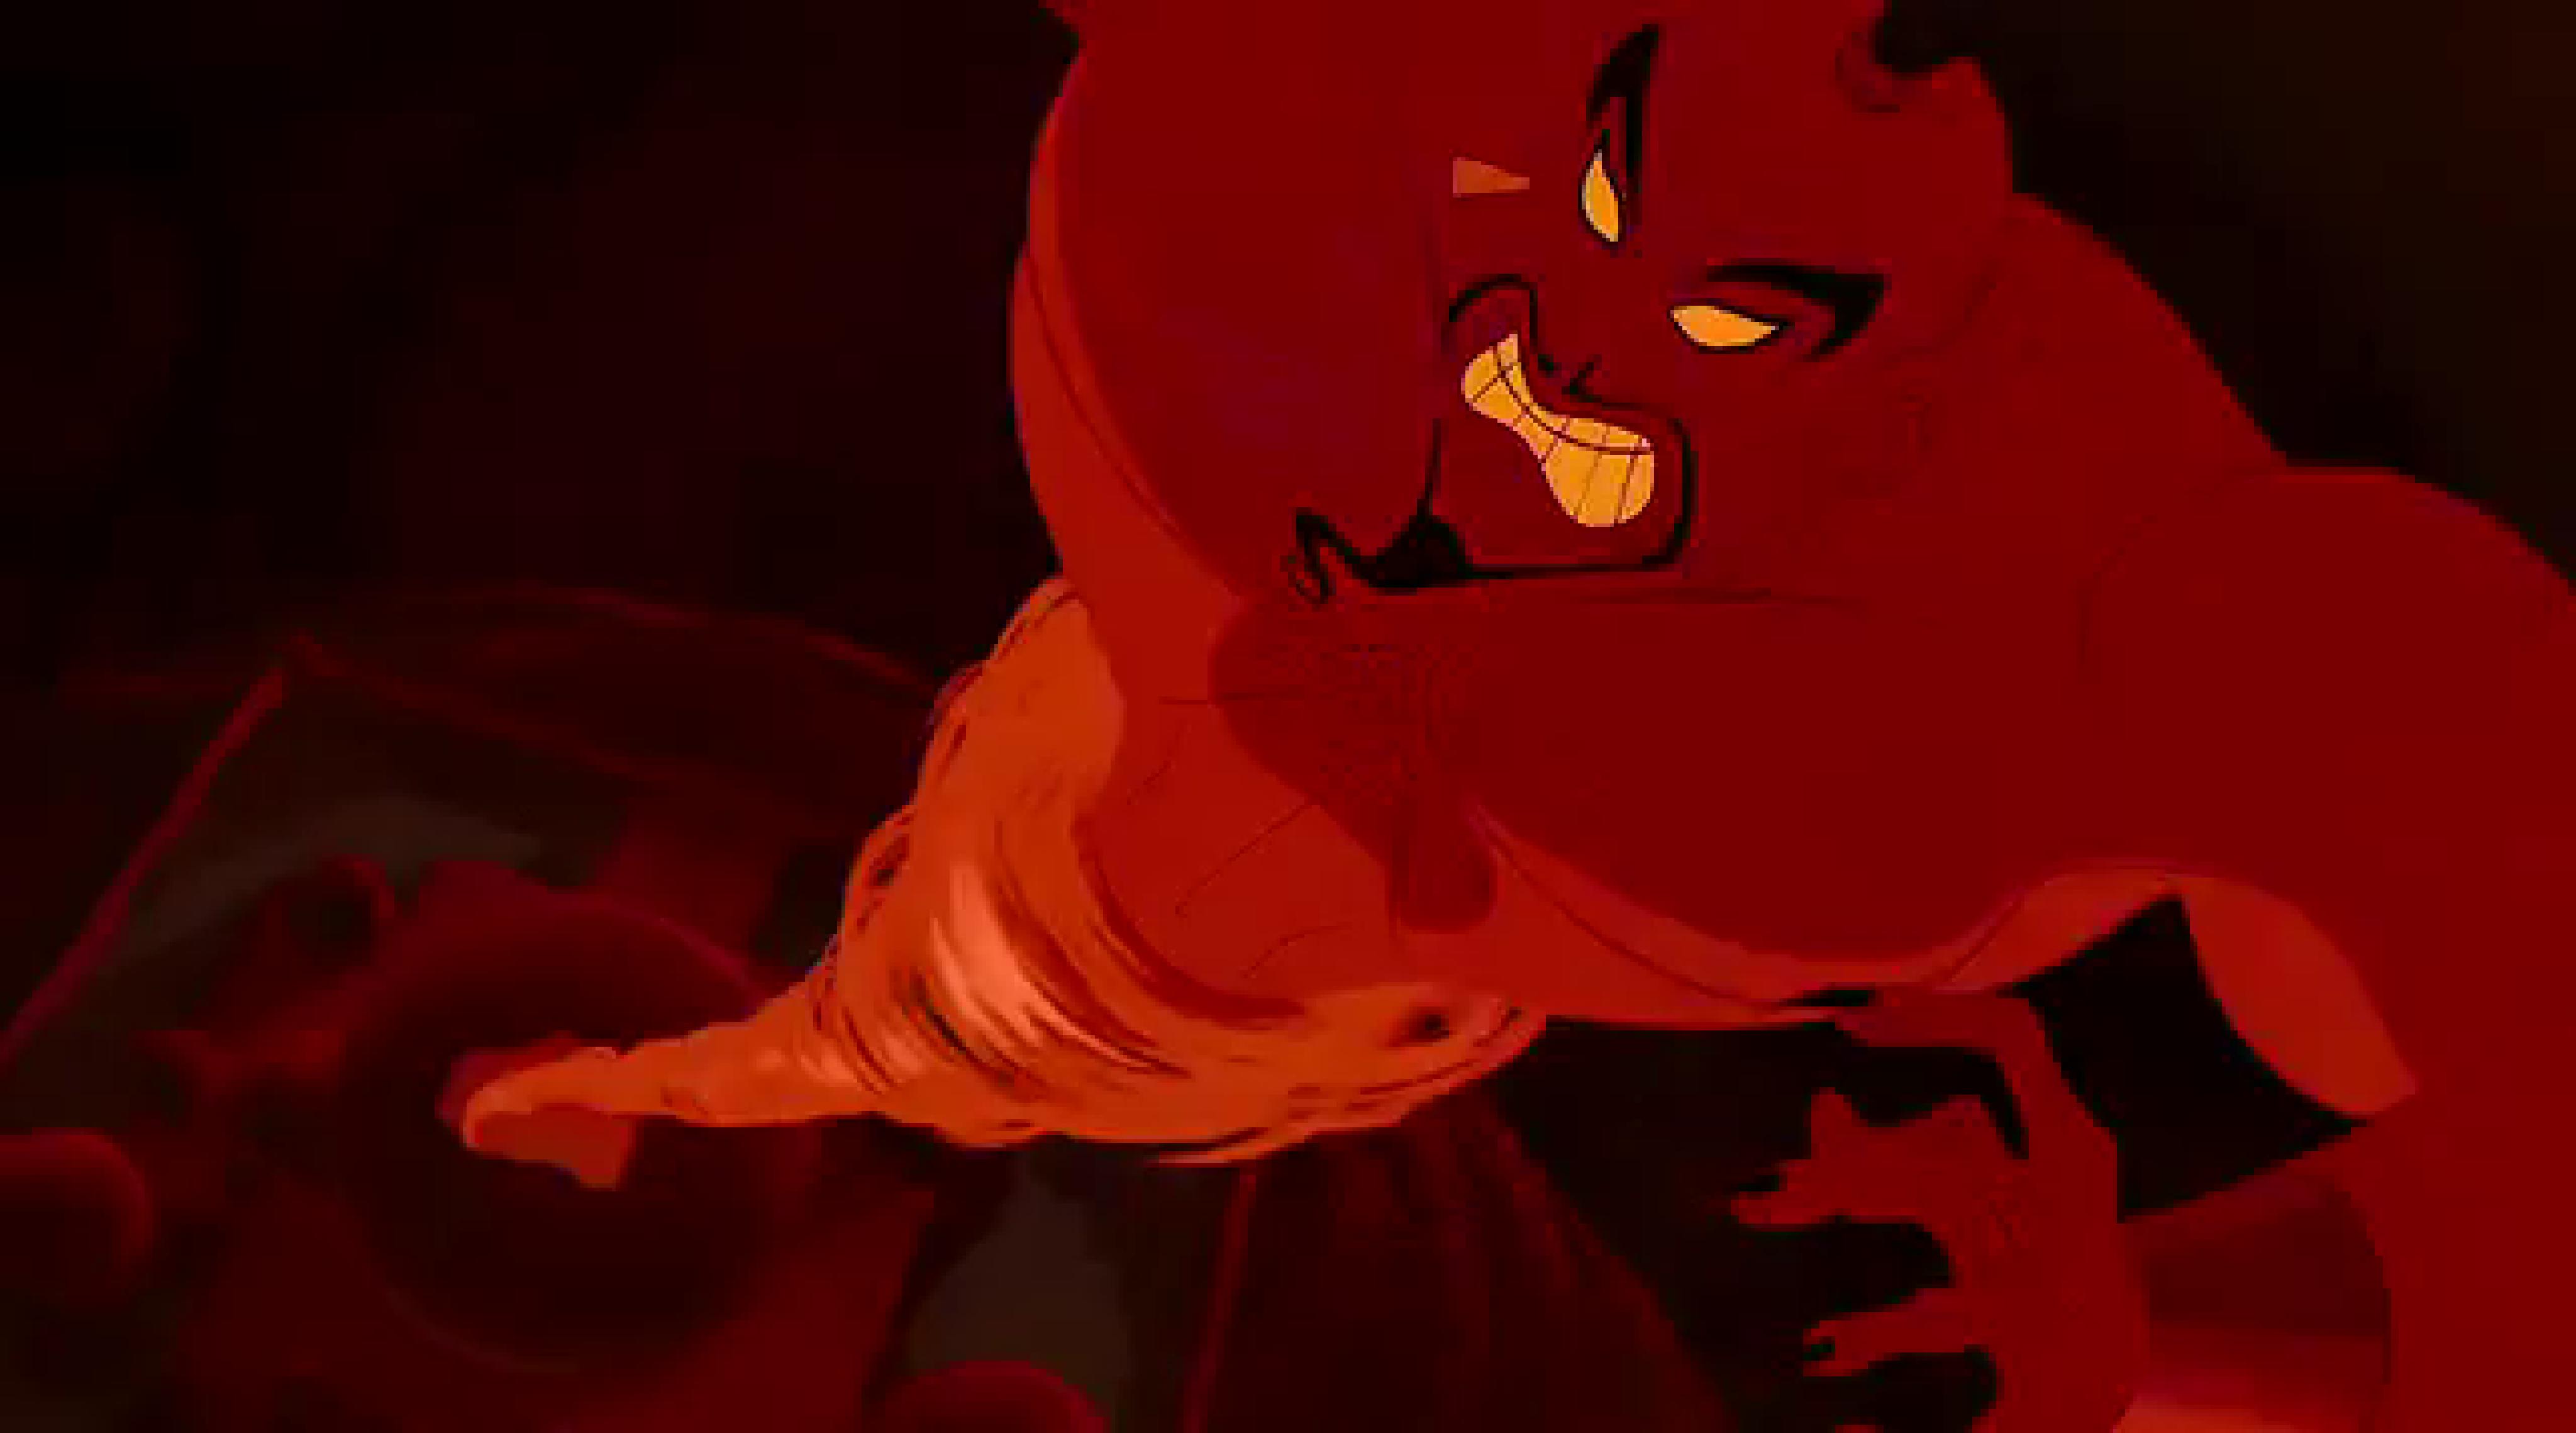 File:Genie Jafar - Part 6.png